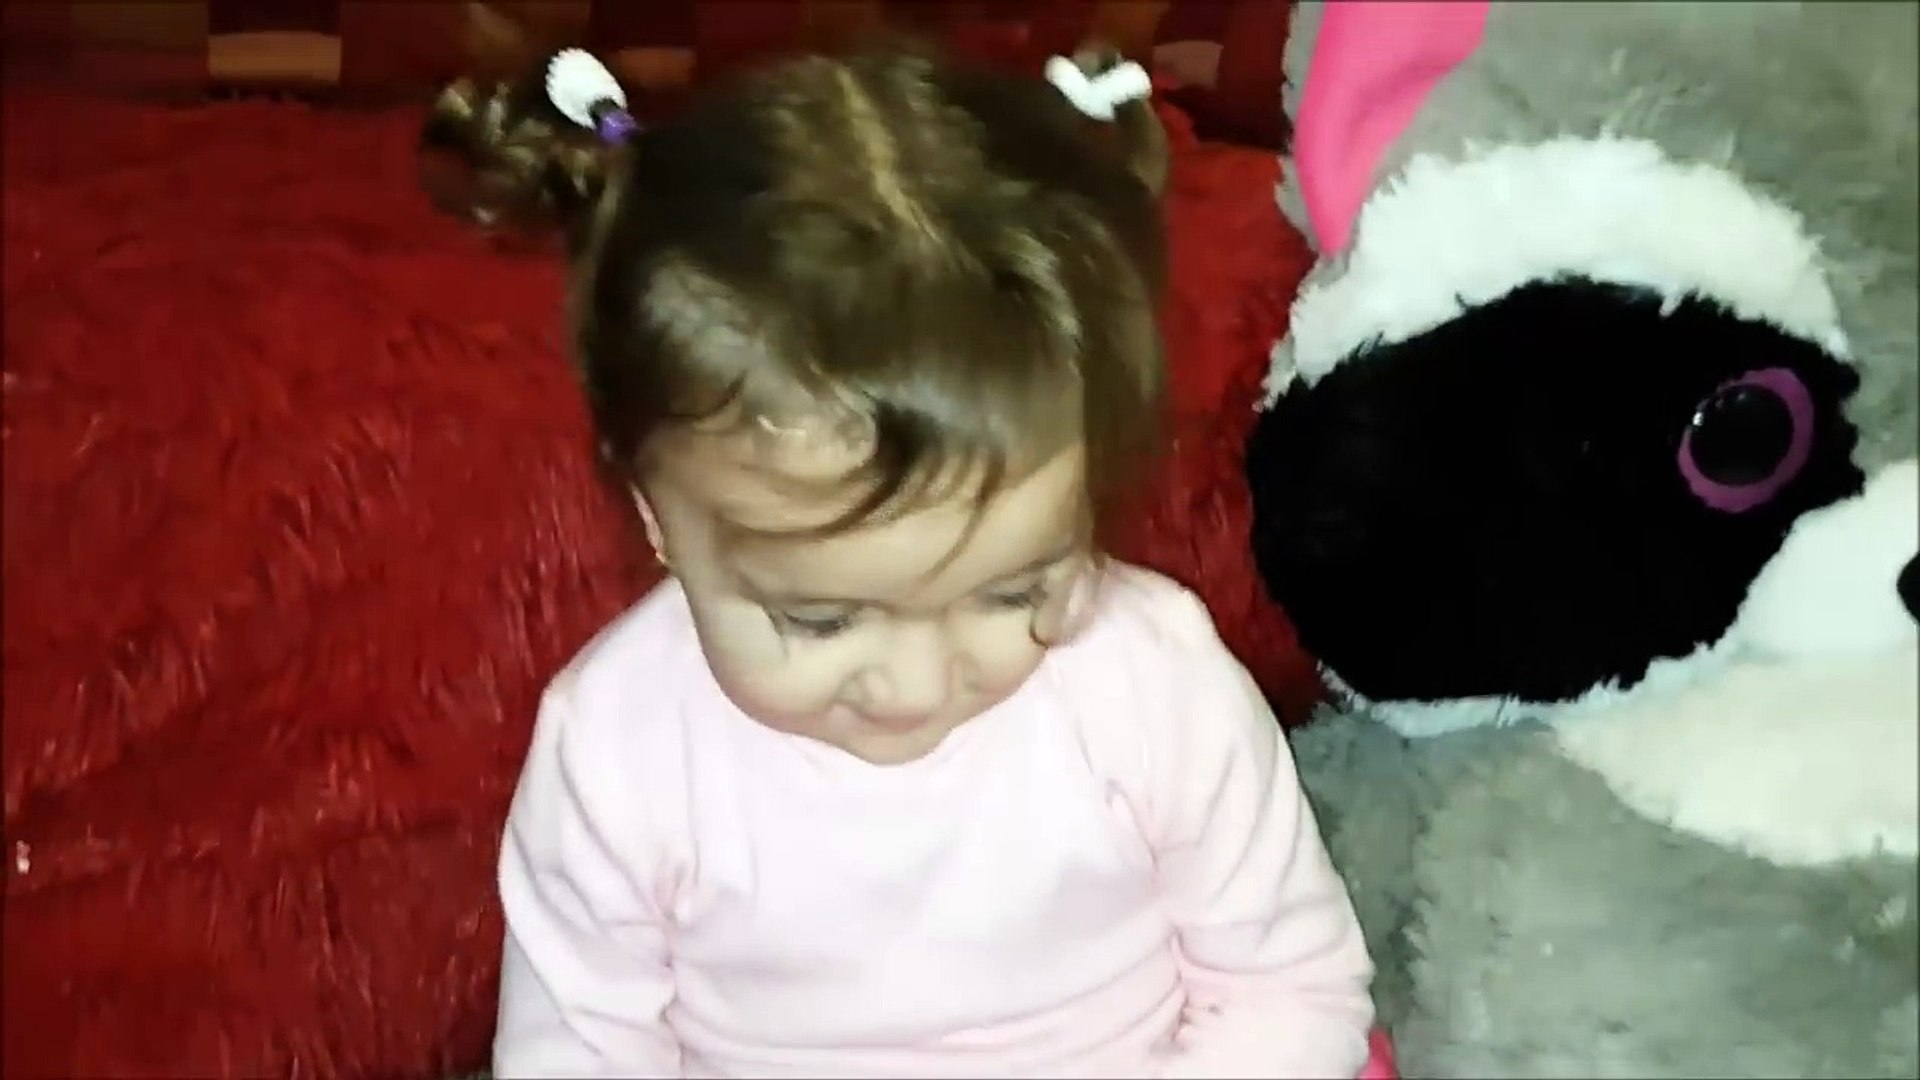 Полтора годика девочка поздравляет С Новым годом One and a half years old girl Happy New Year